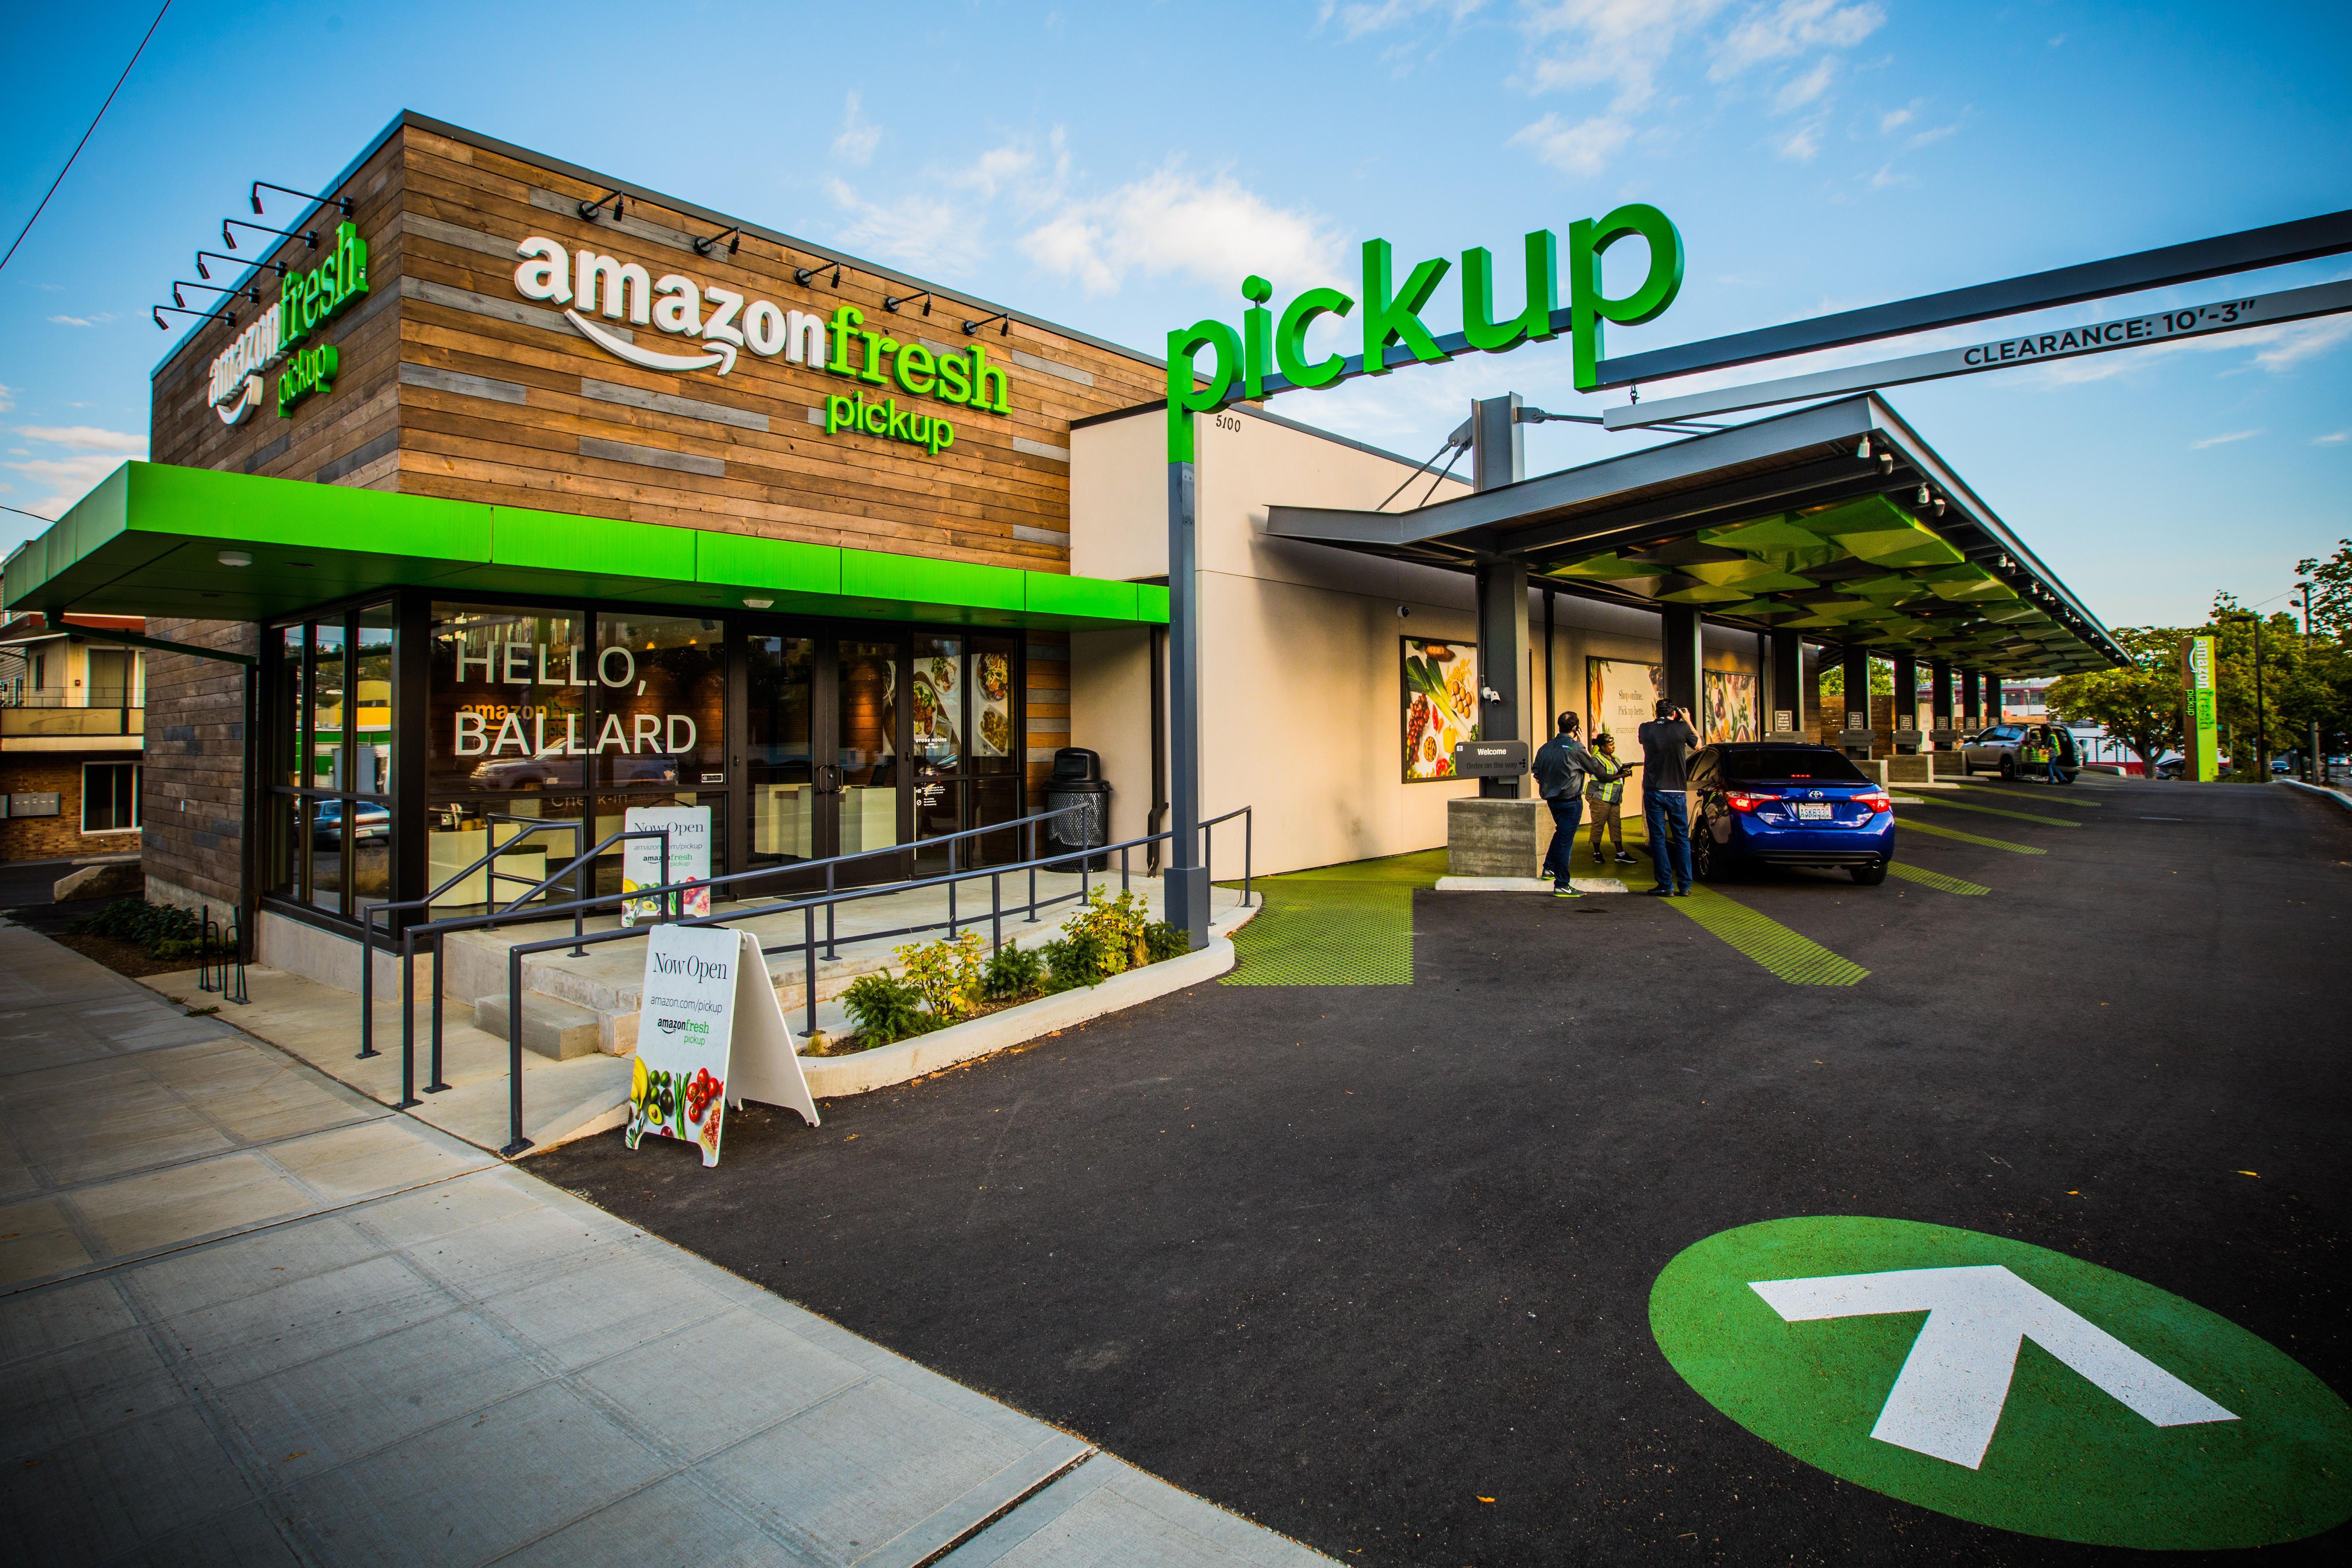 amazon-fresh-pickup-grocery-shopping-9625